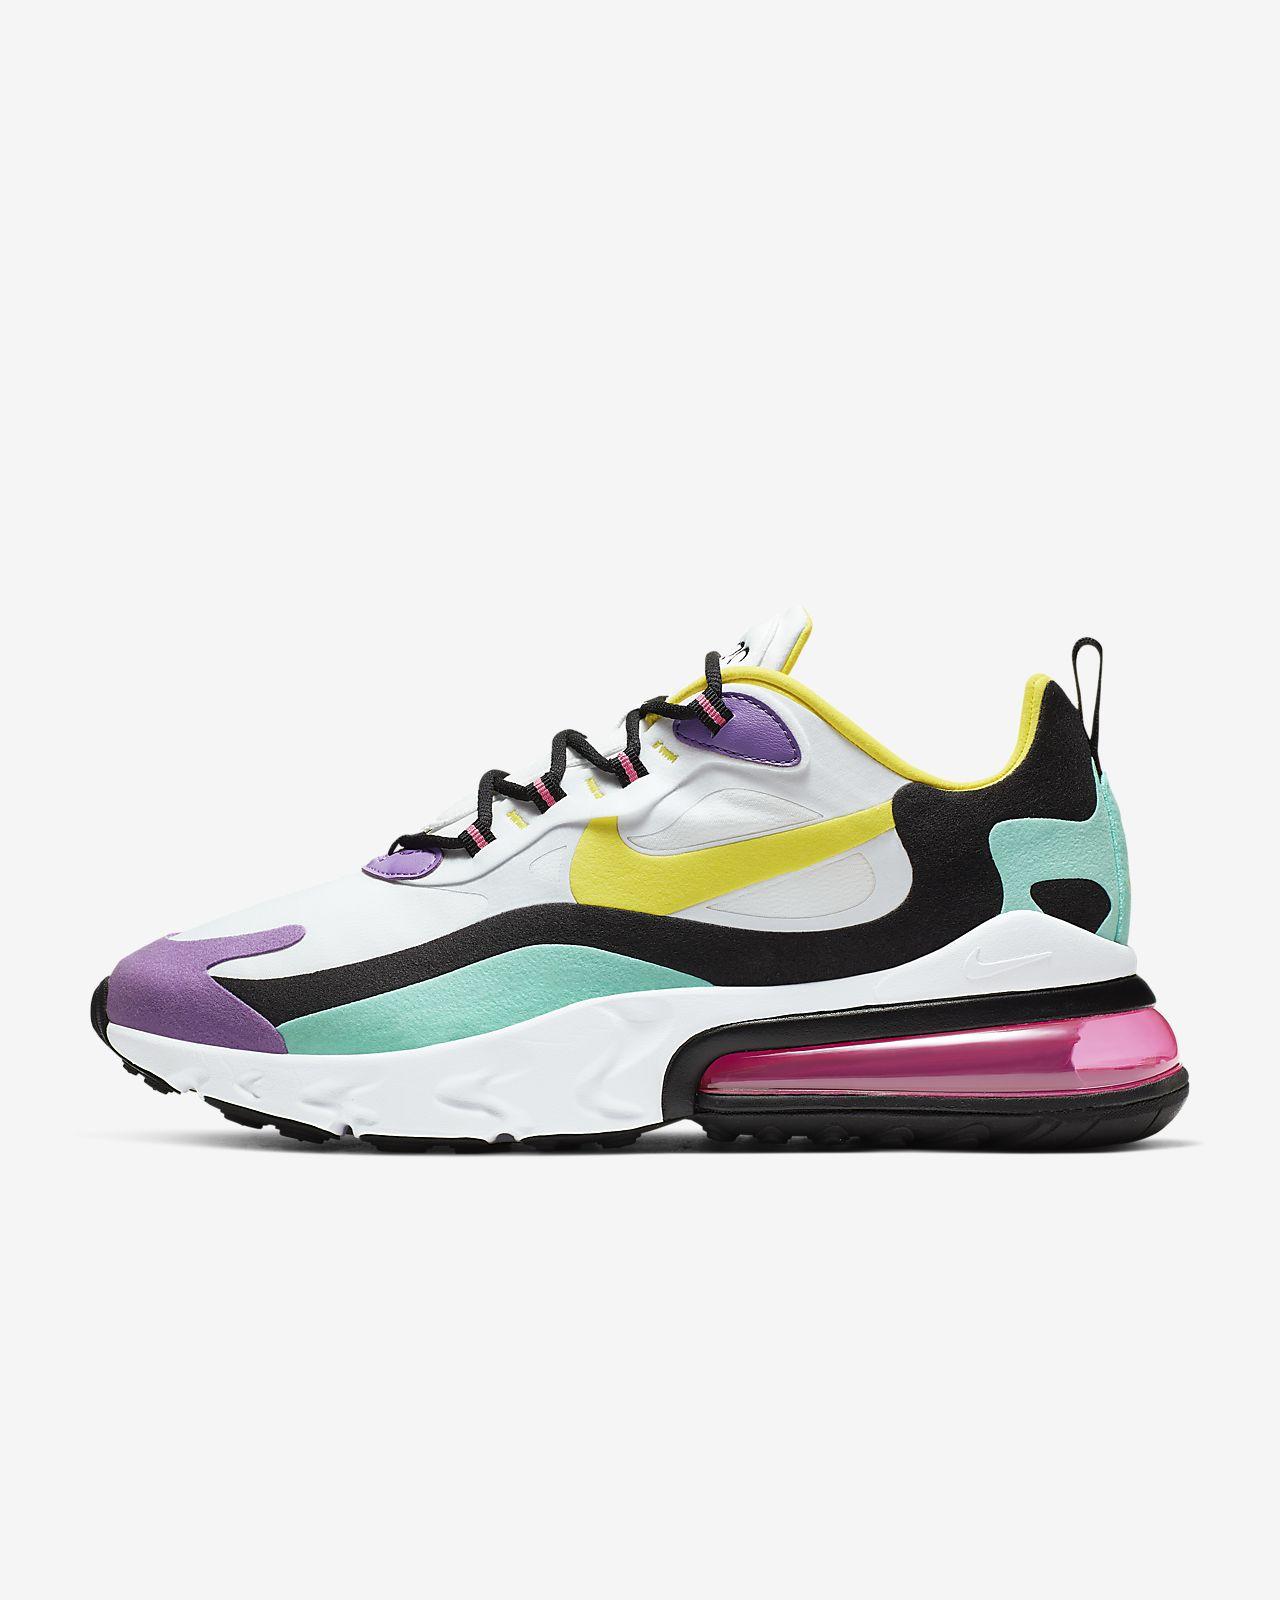 Nike Air Max 270 React (Geometric Art) Men's Shoes